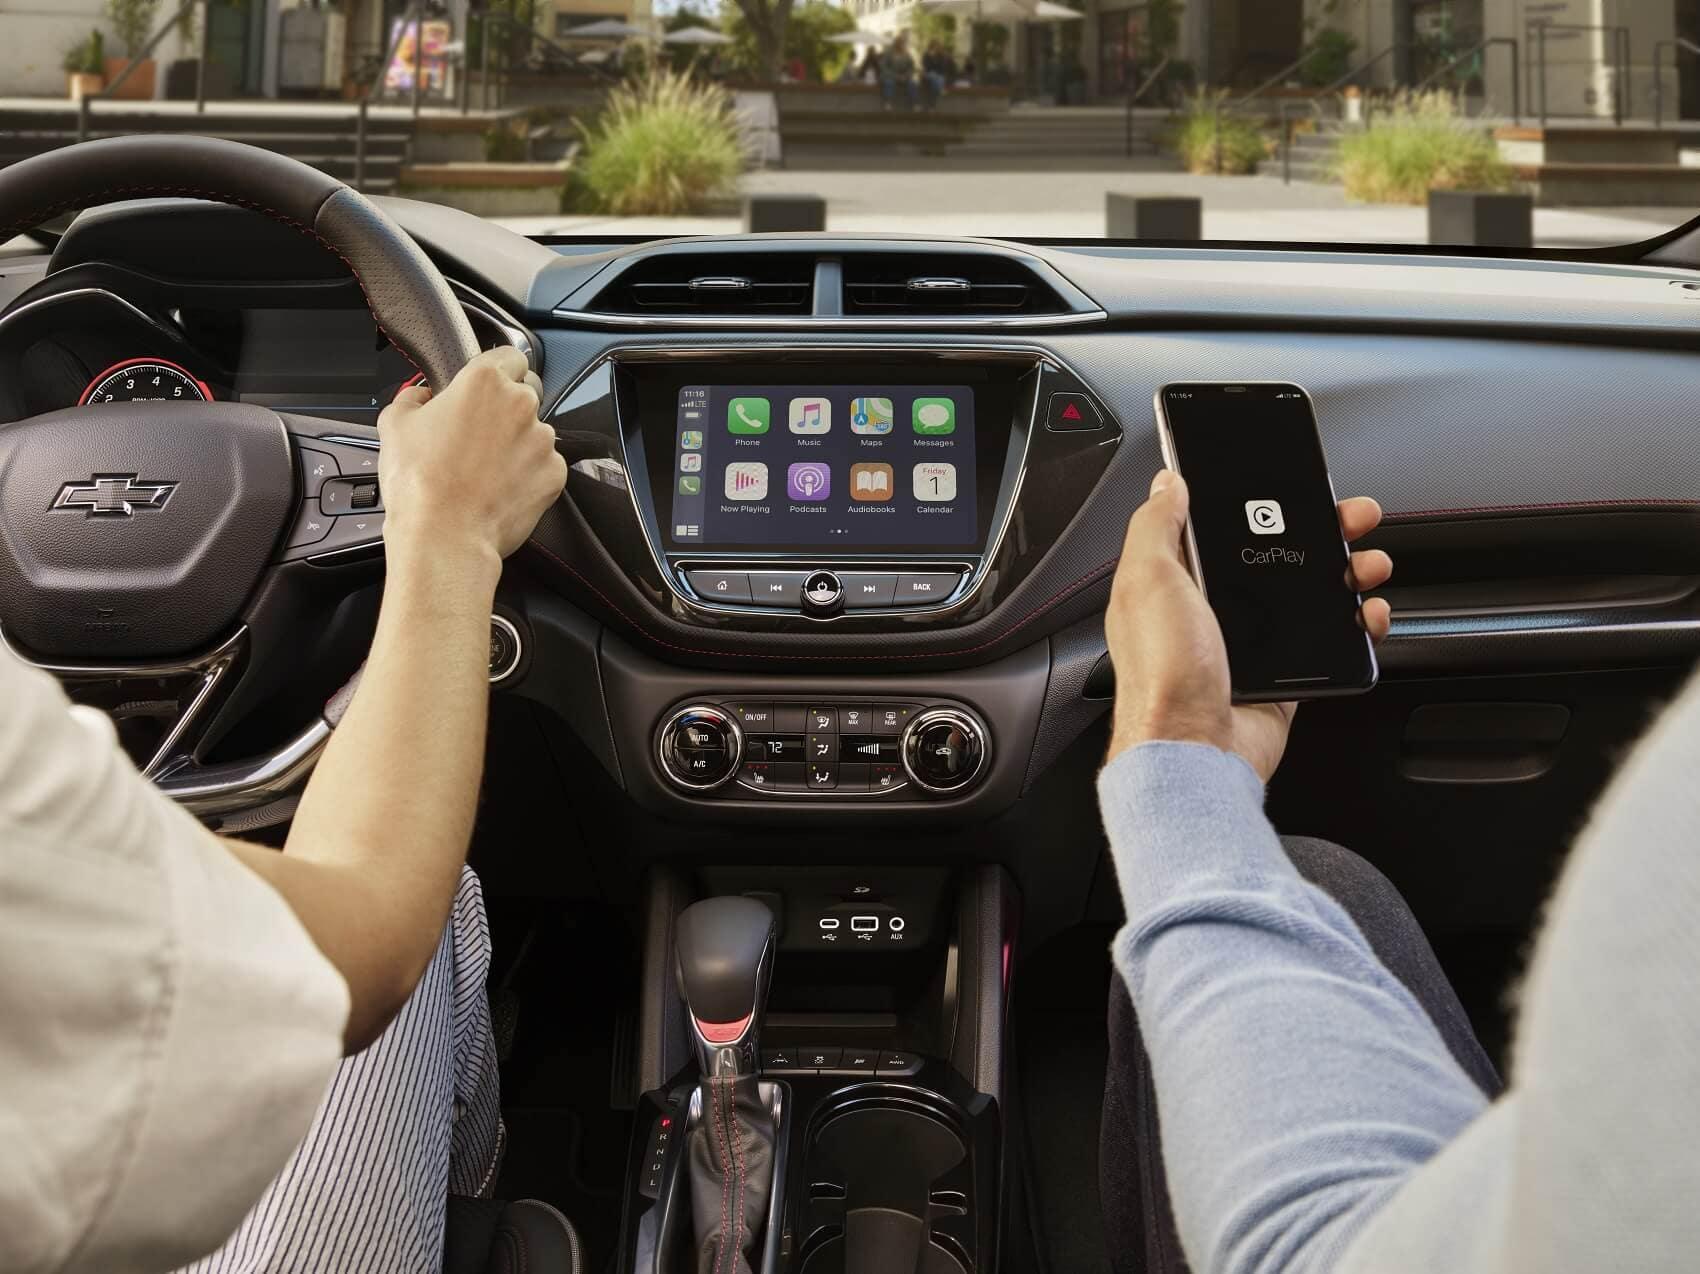 2021 Chevrolet Trailblazer Interior with Apple CarPlay® Technology